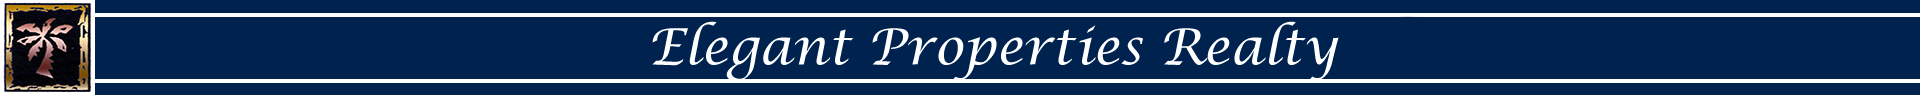 elegant properties banner